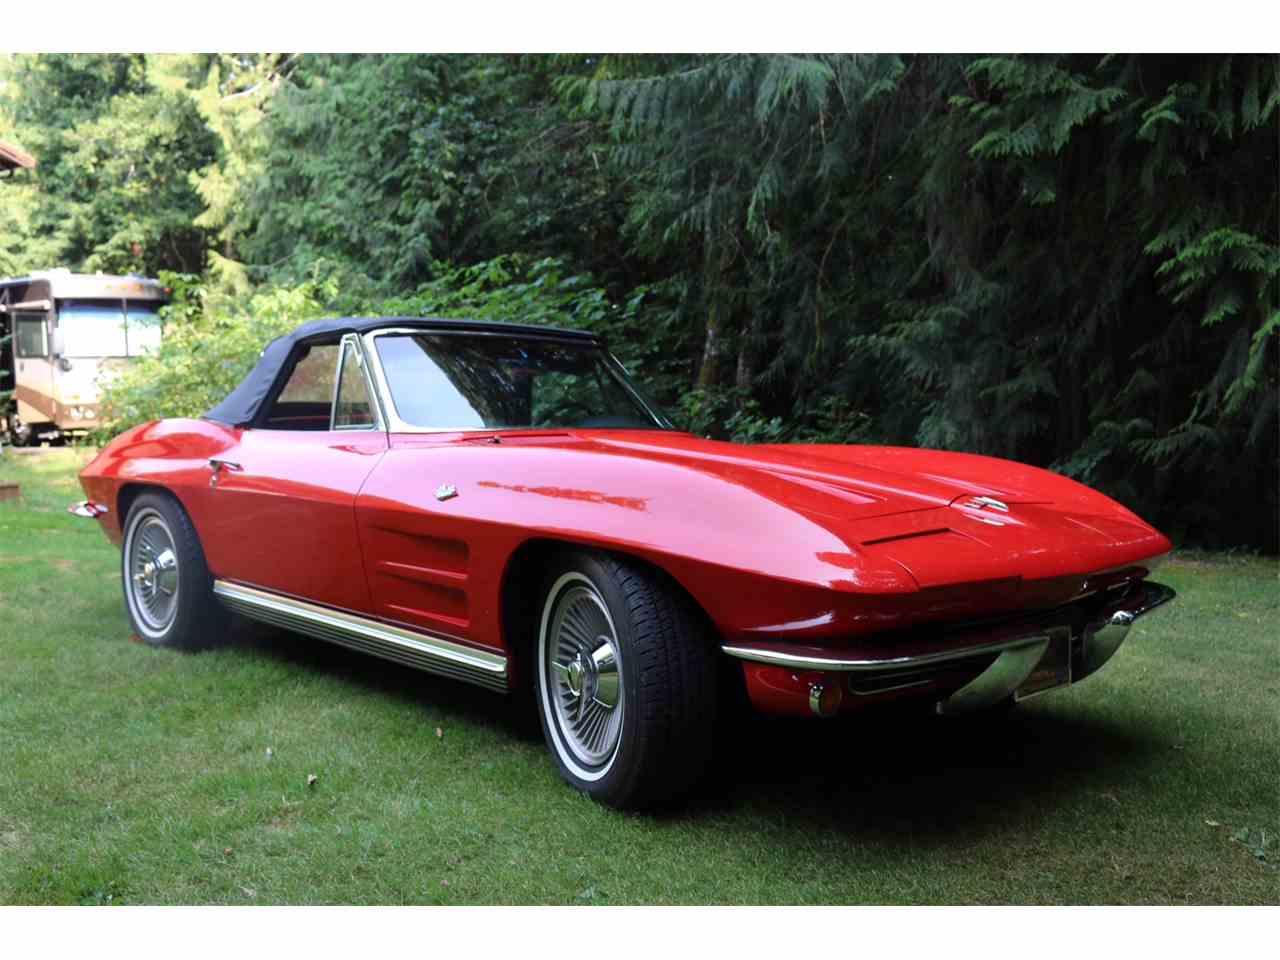 1964 Chevrolet Corvette Stingray For Sale Classiccars